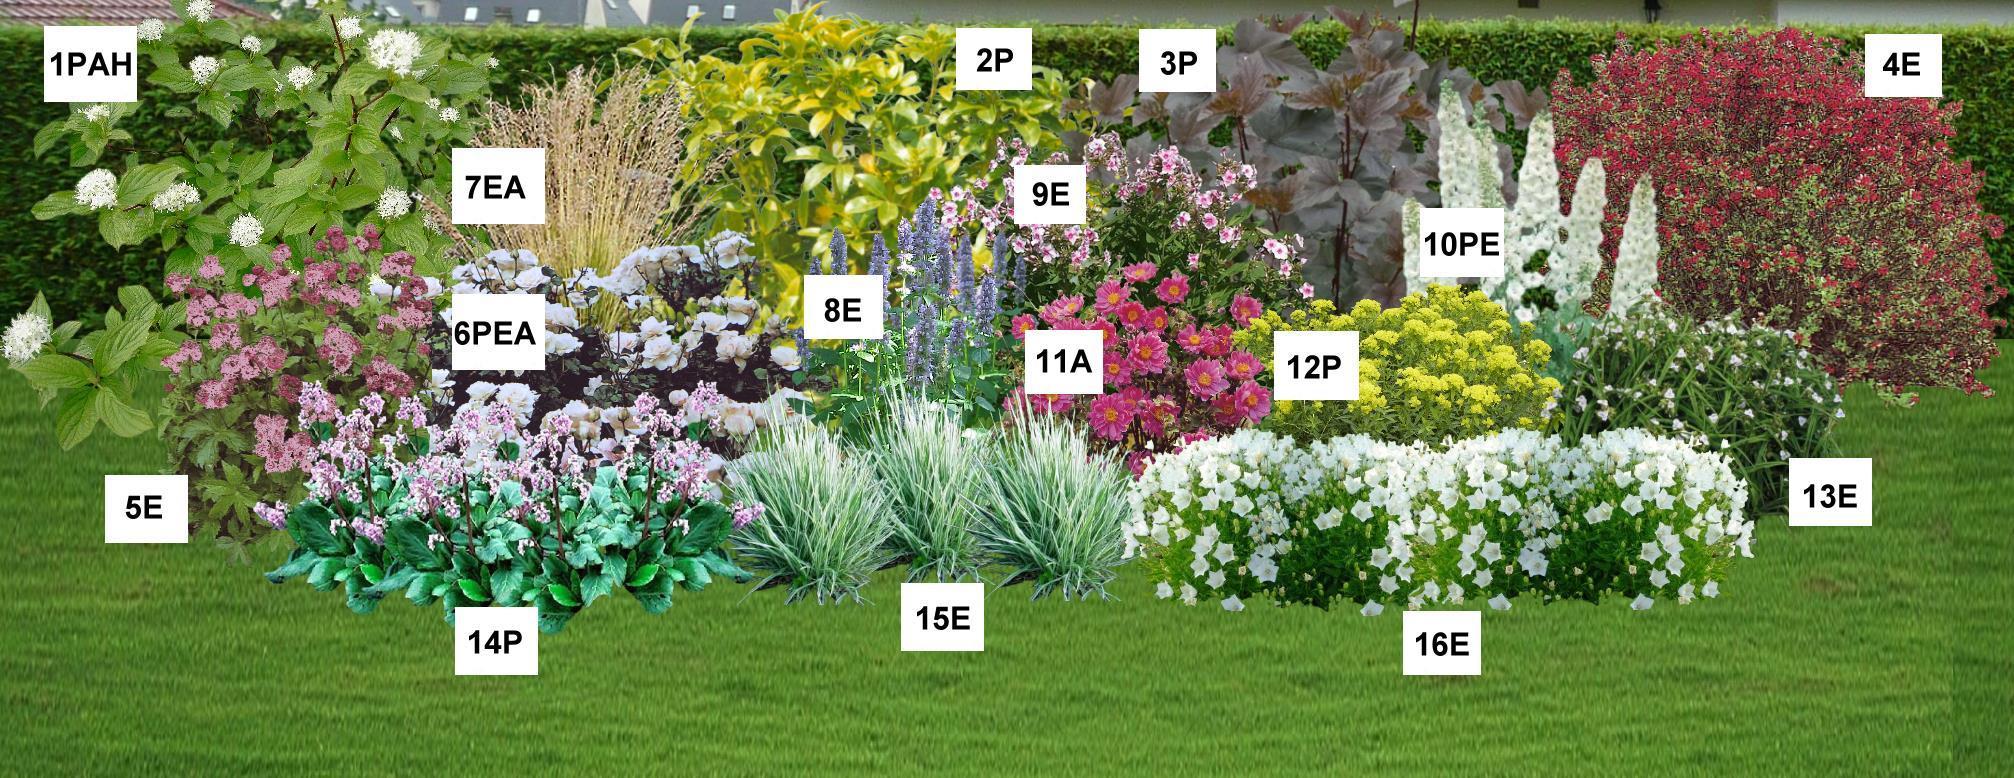 Le jardin du pic vert for Le jardin du pic vert